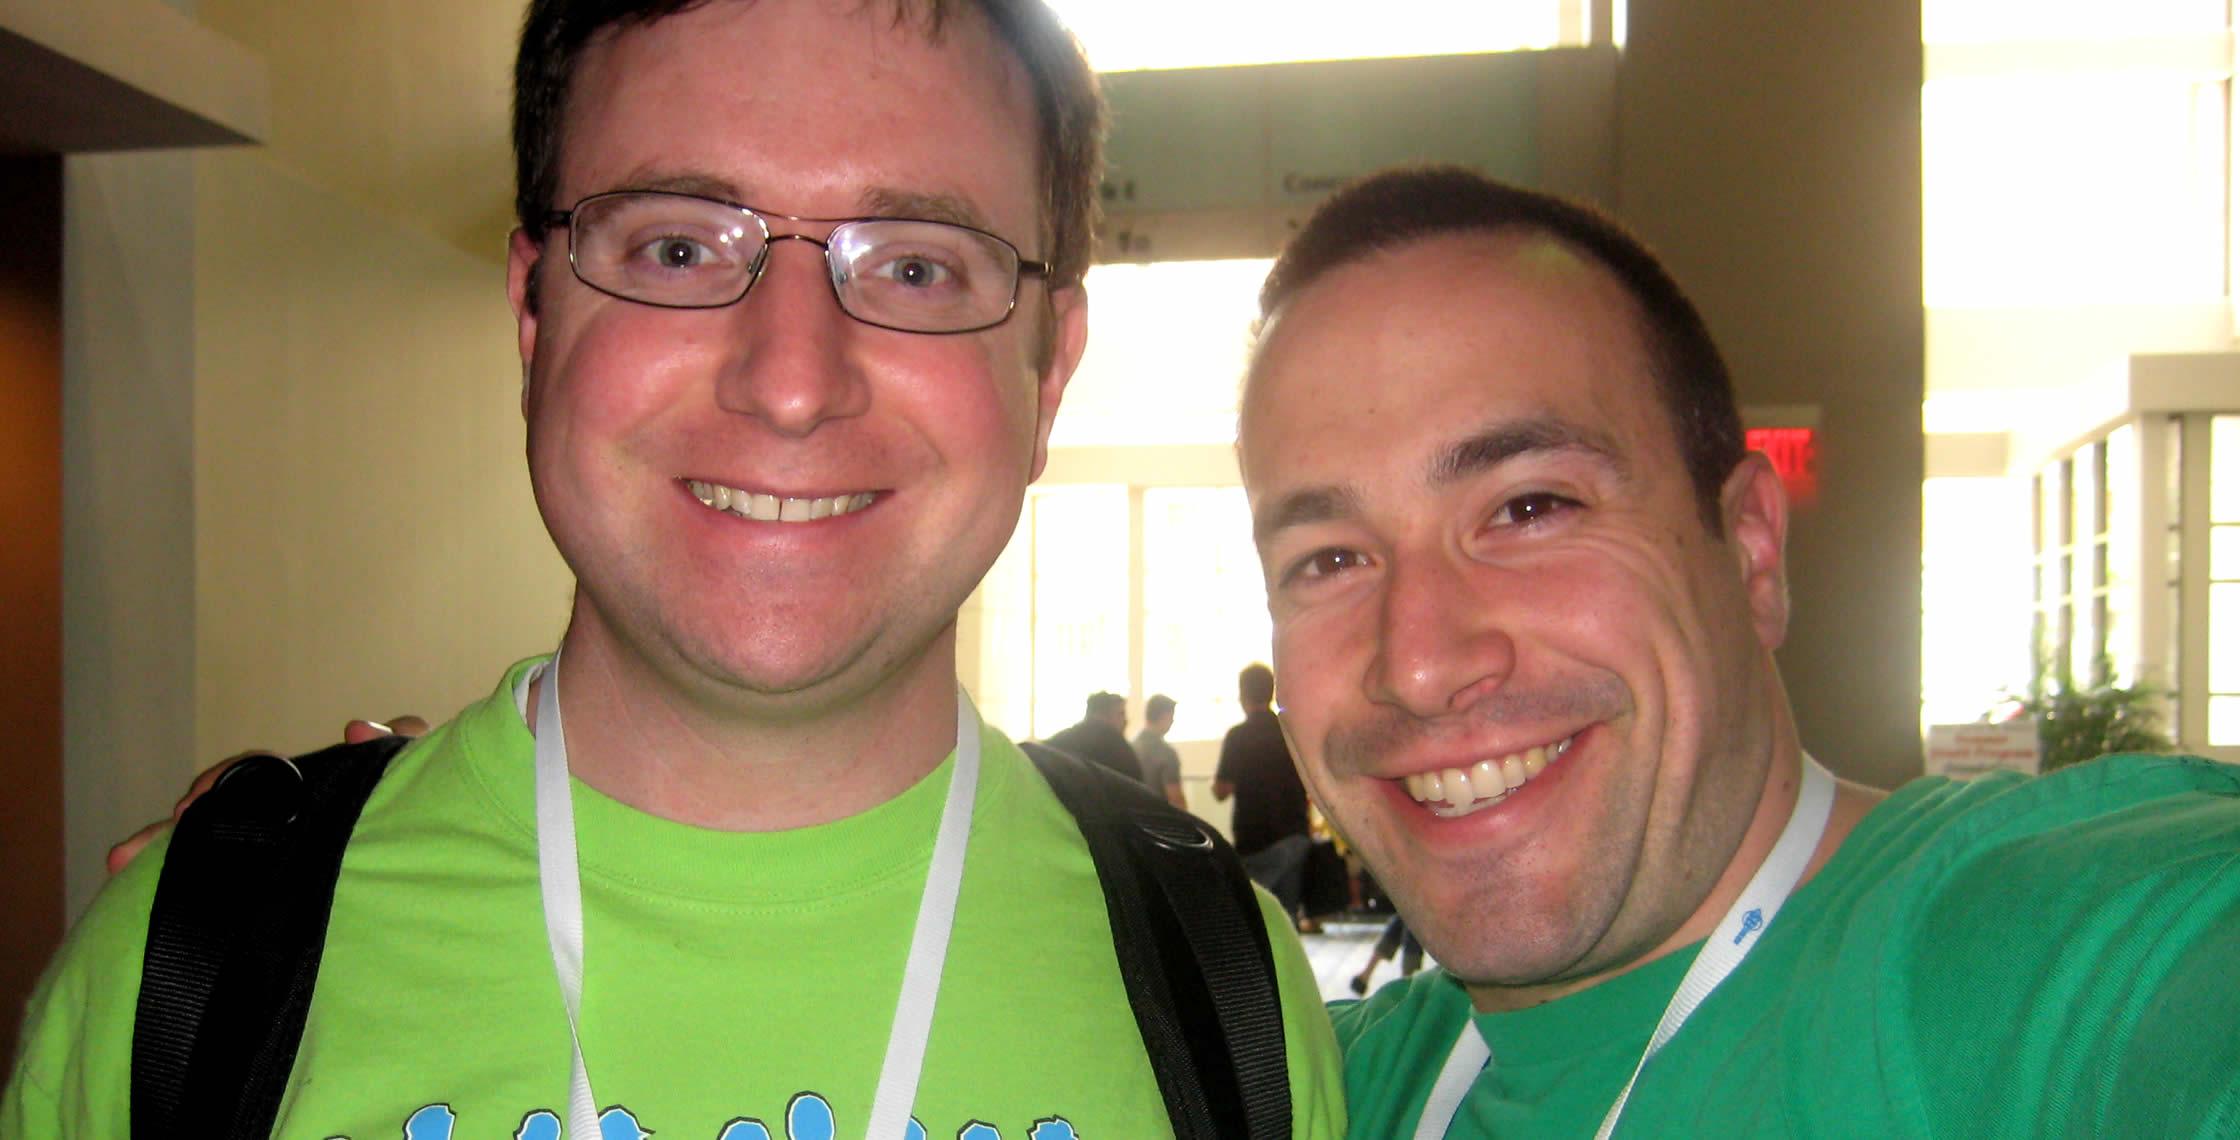 Ben Nadel at CFUNITED 2008 (Washington, D.C.) with: Jacob Munson